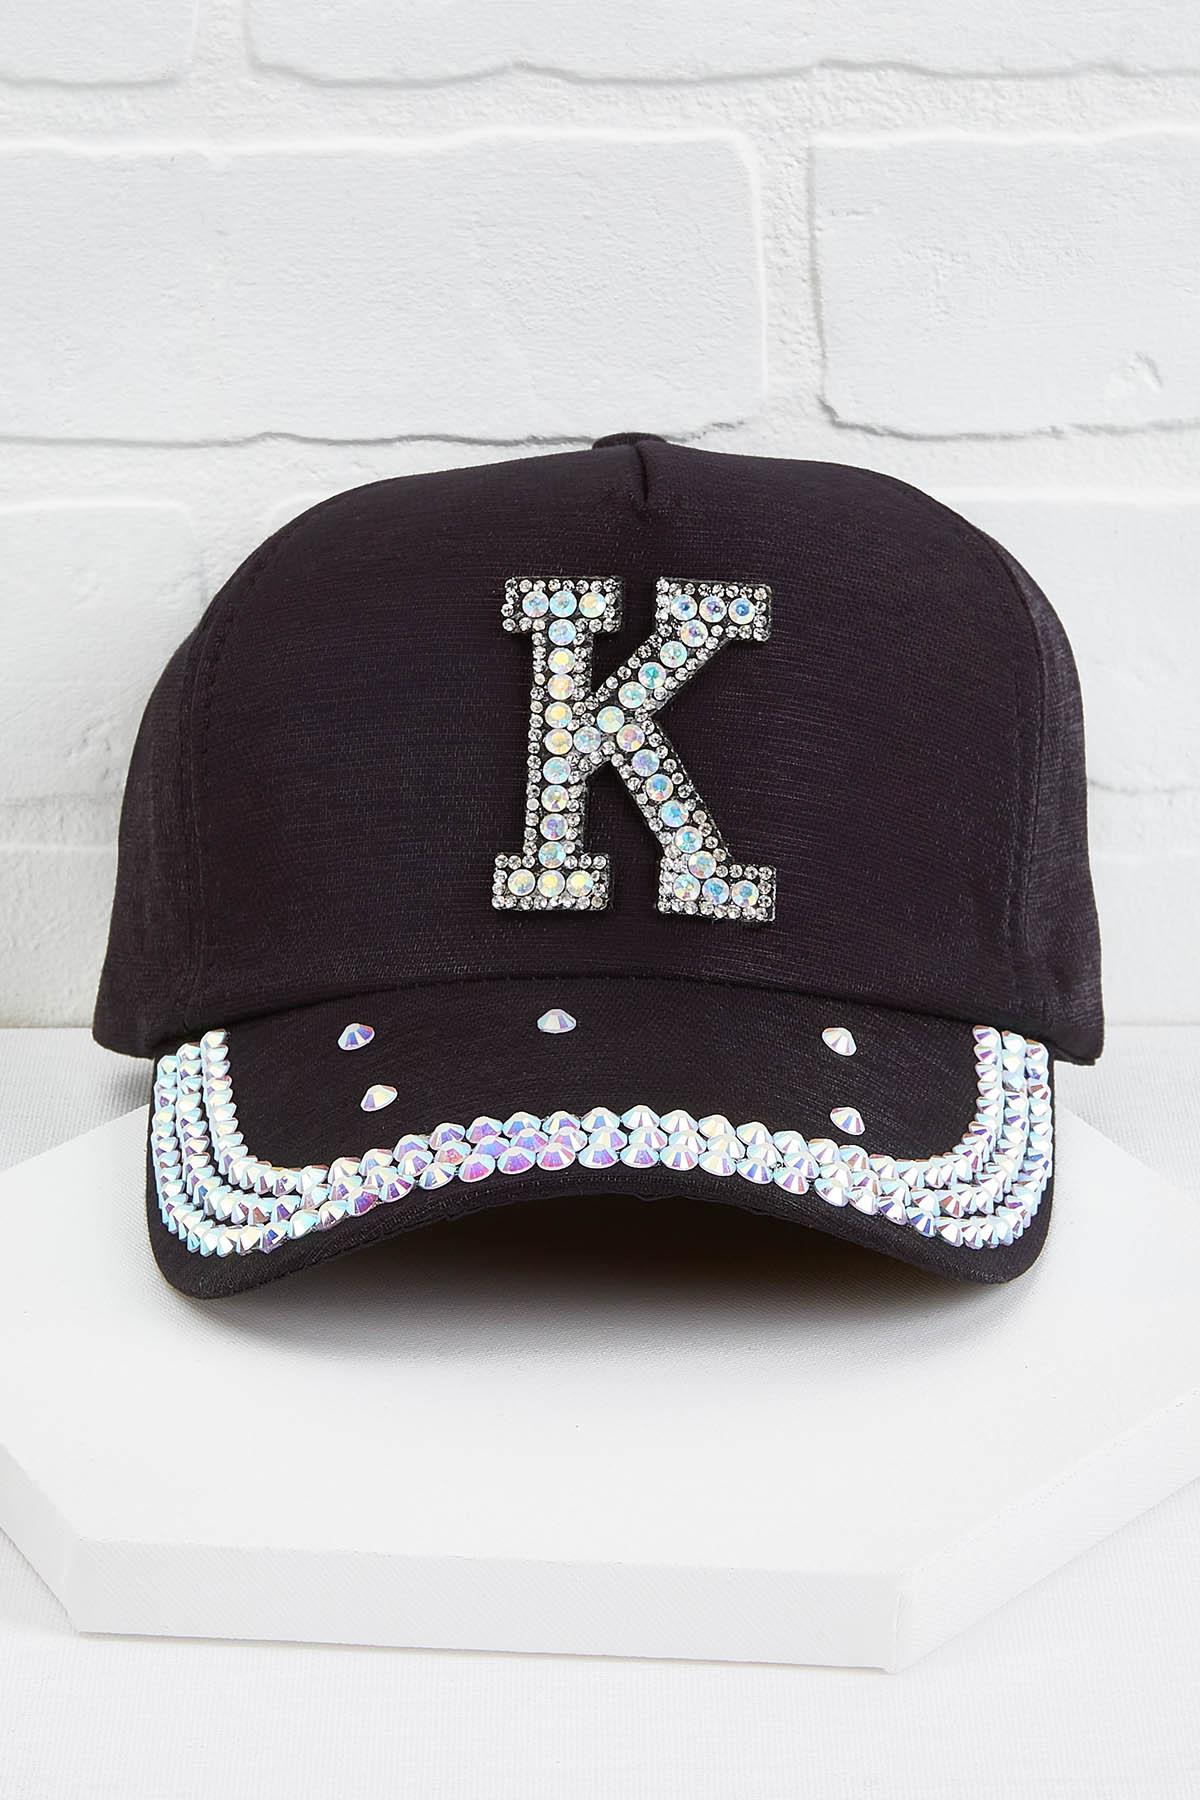 K Initial Bling Baseball Cap